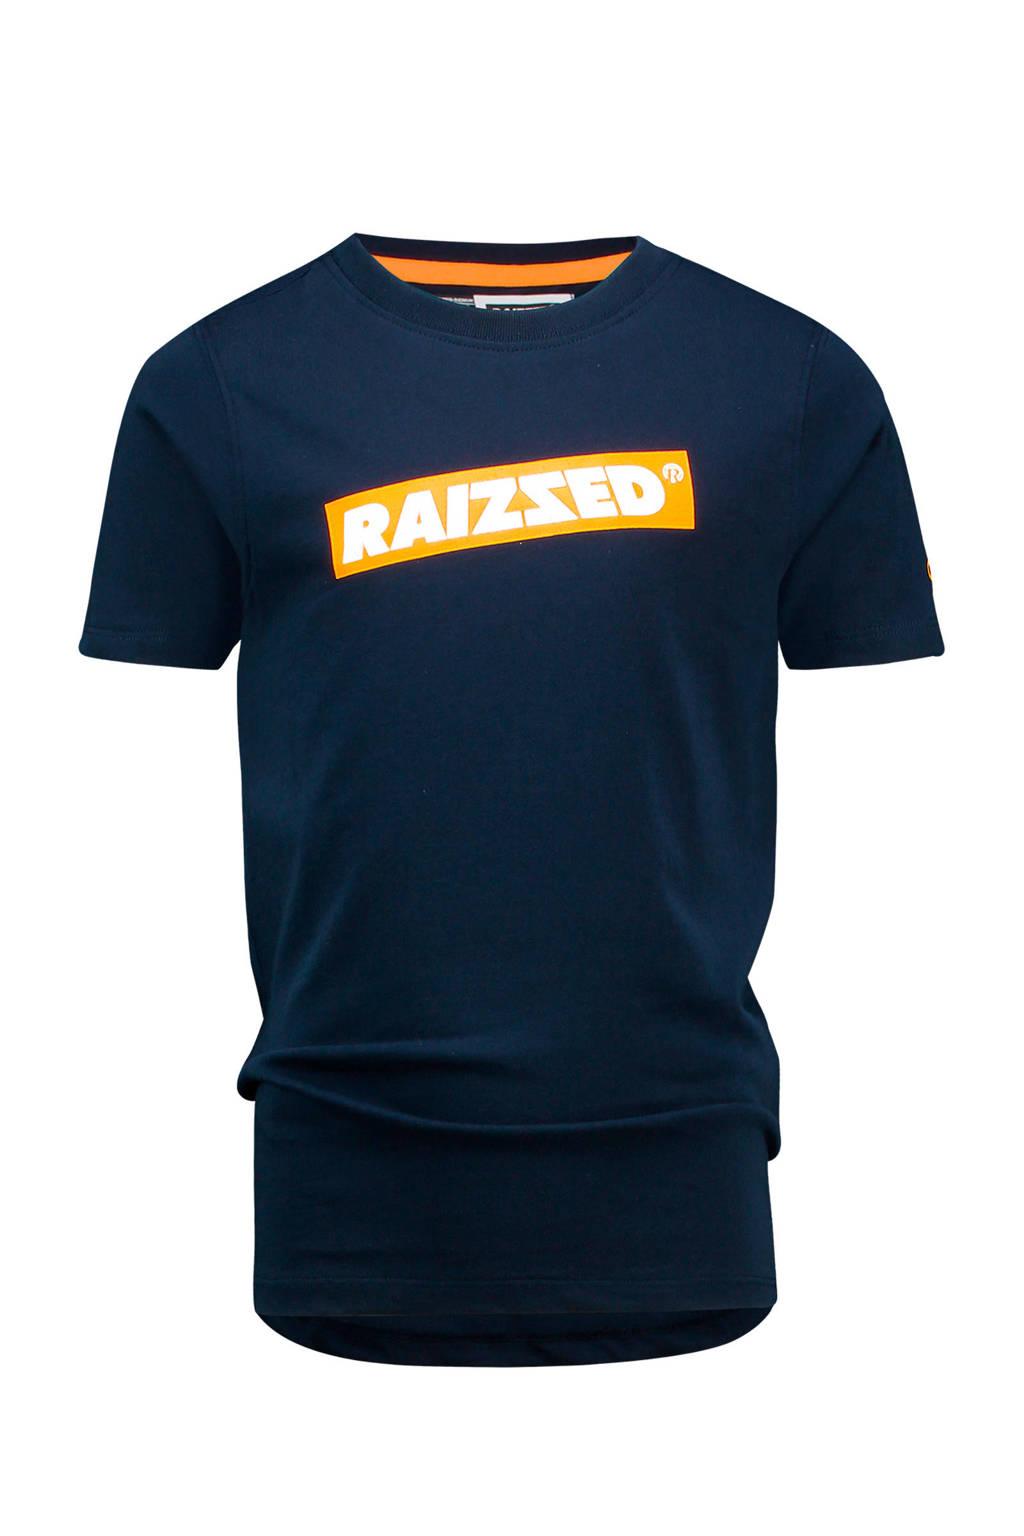 Raizzed T-shirt Hudson met logo donkerblauw, Donkerblauw